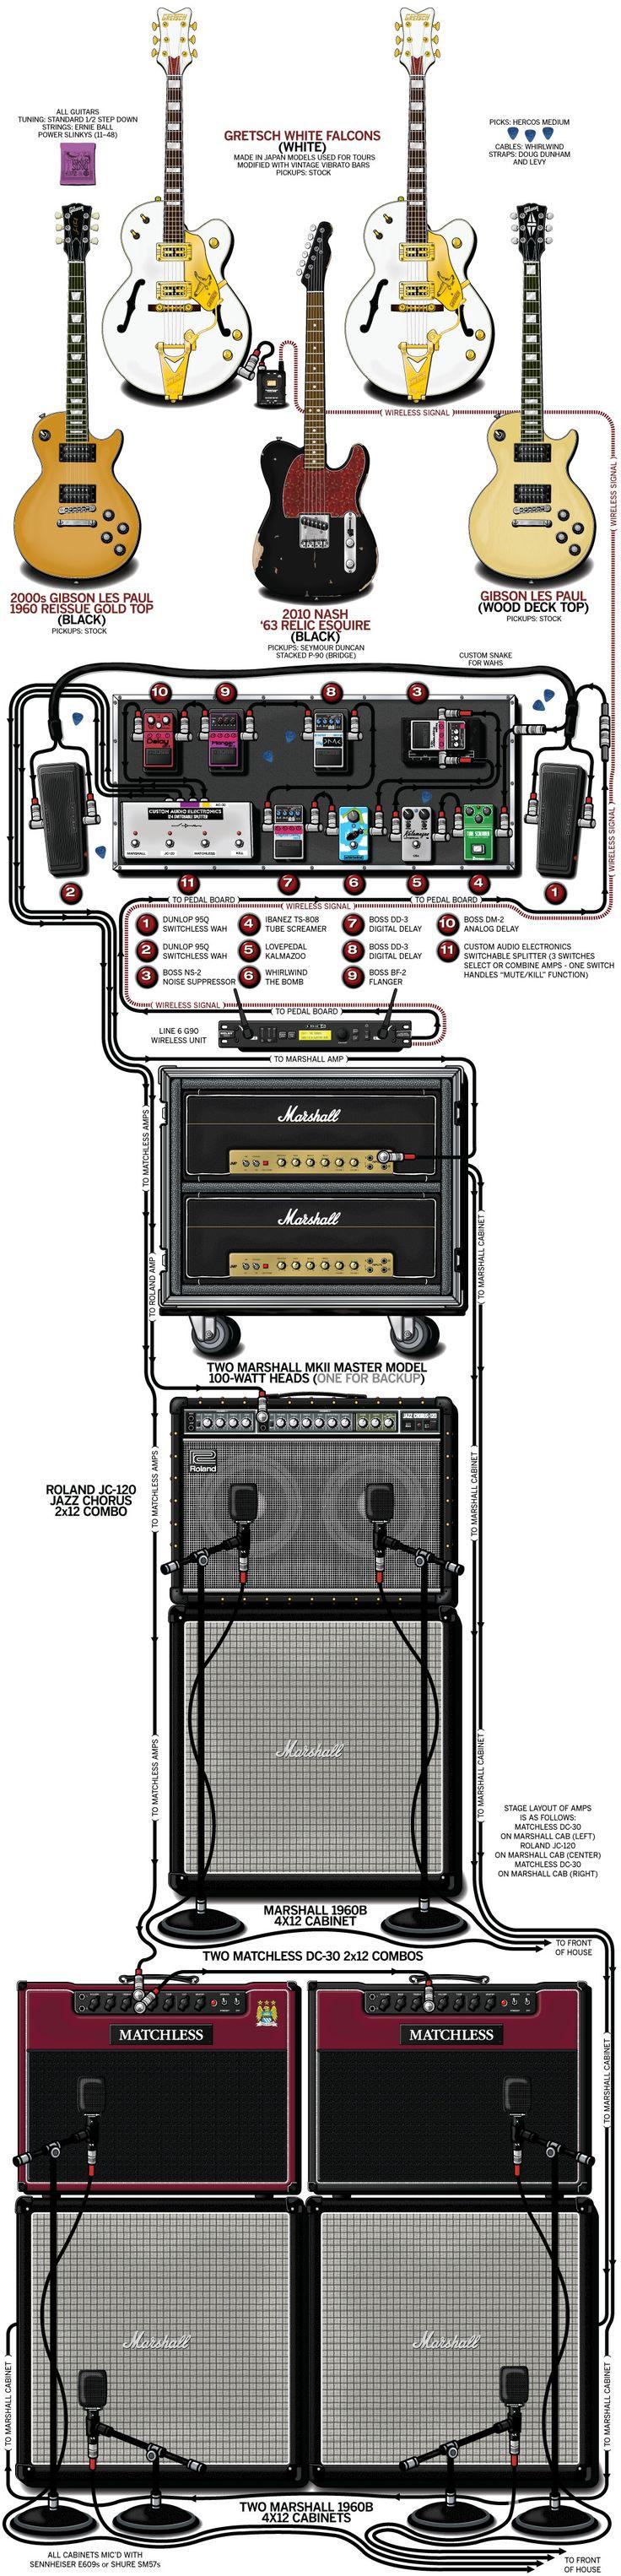 Billy Duffy's 2012 guitar rig :: #Gretsch White Falcon #Gibson Les Paul